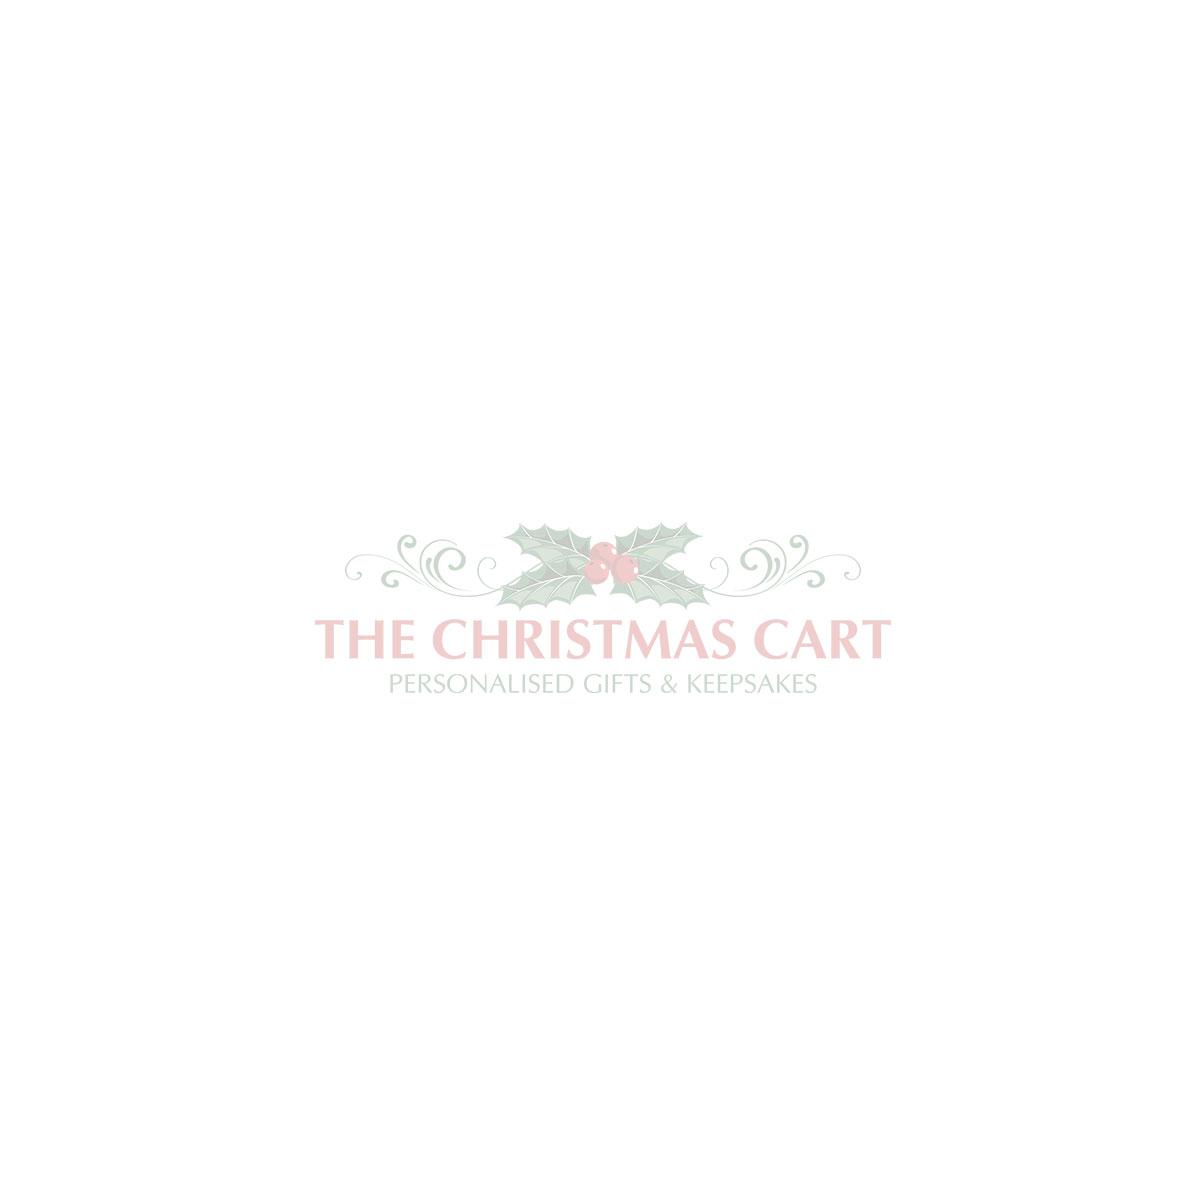 Thursday 14th November @ 5pm - Gold Hoop Christmas Wreath Workshop